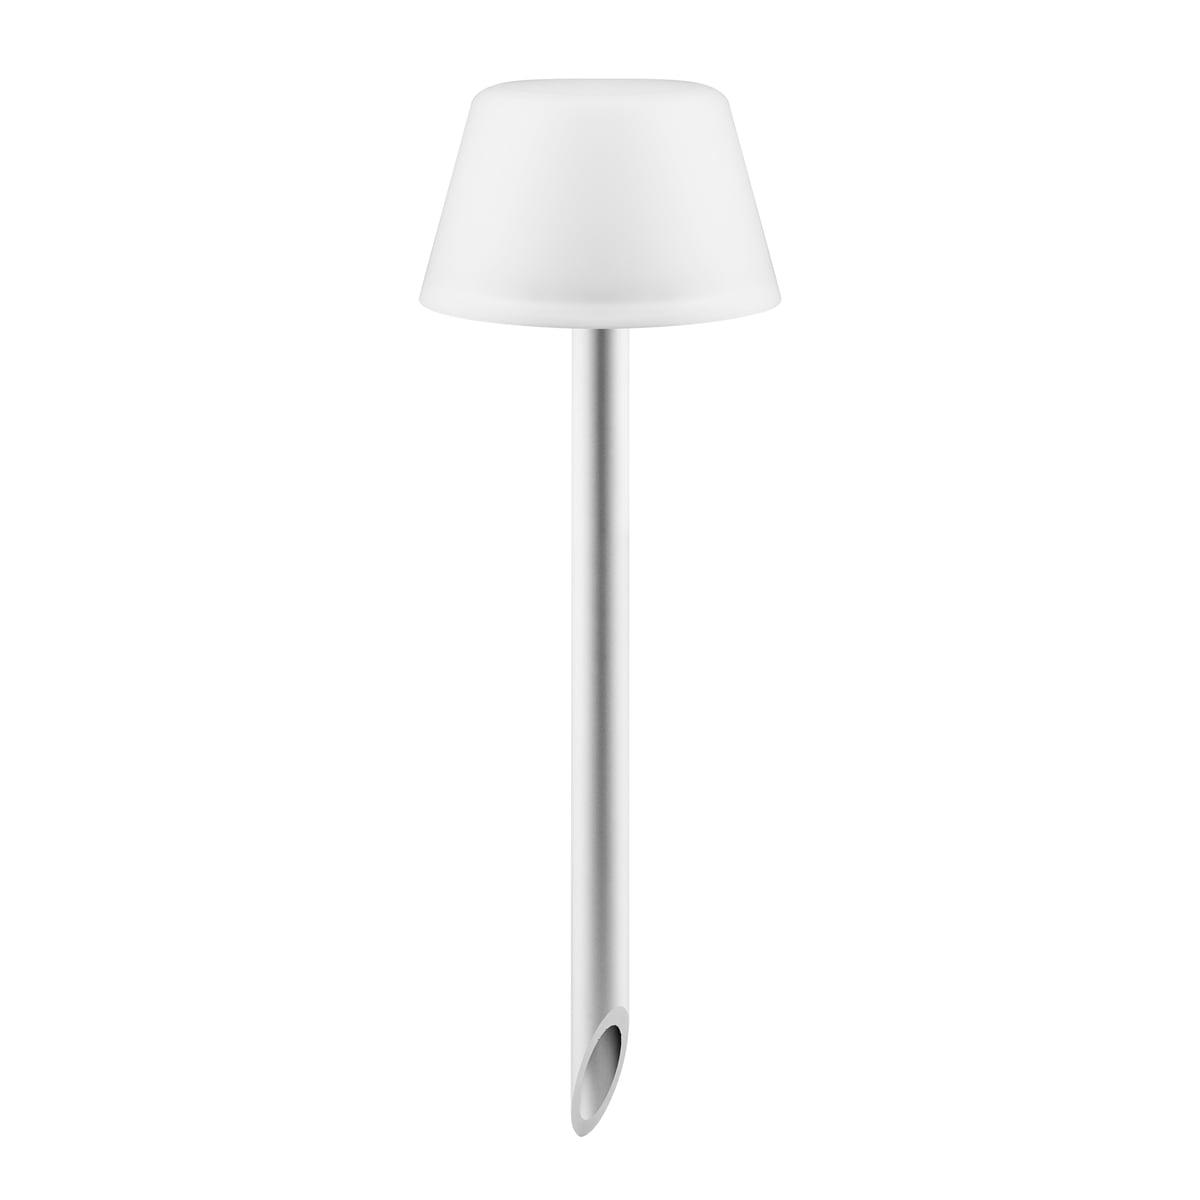 Eva Solo - SunLight - garden lamp - SunLight Floor Lamp By Eva Solo